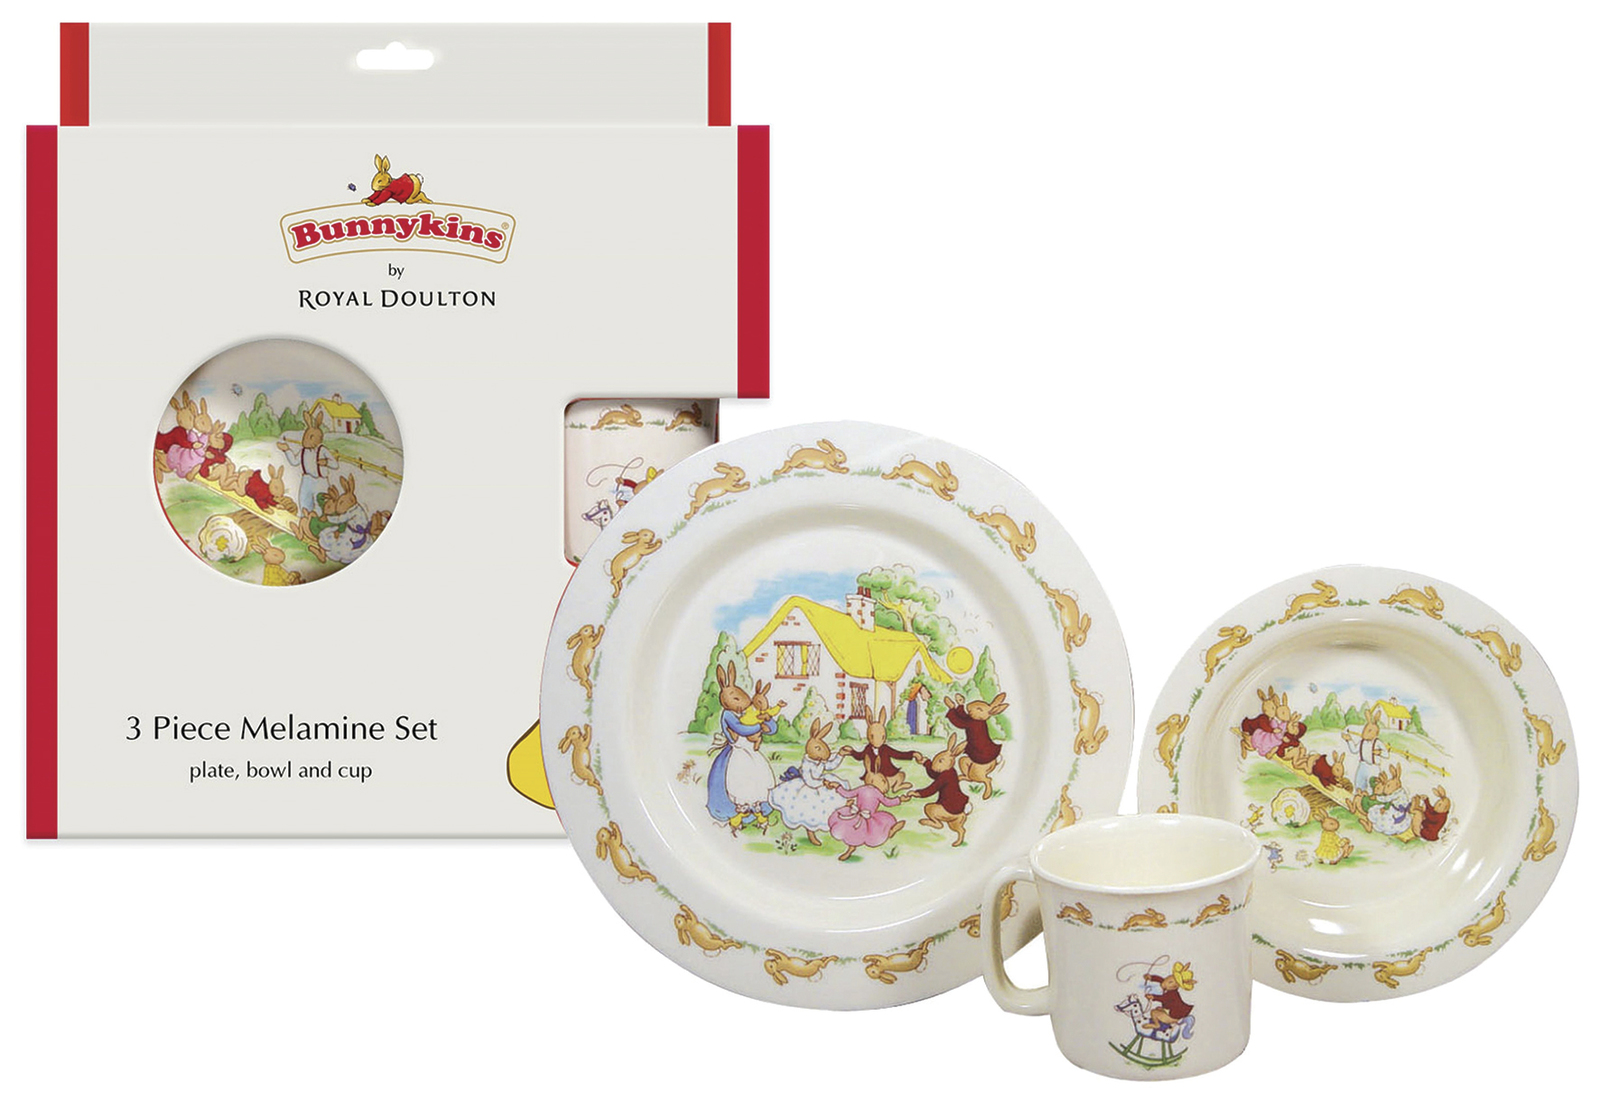 Bunnykins 3 Piece Melamine Set - Royal Doulton image